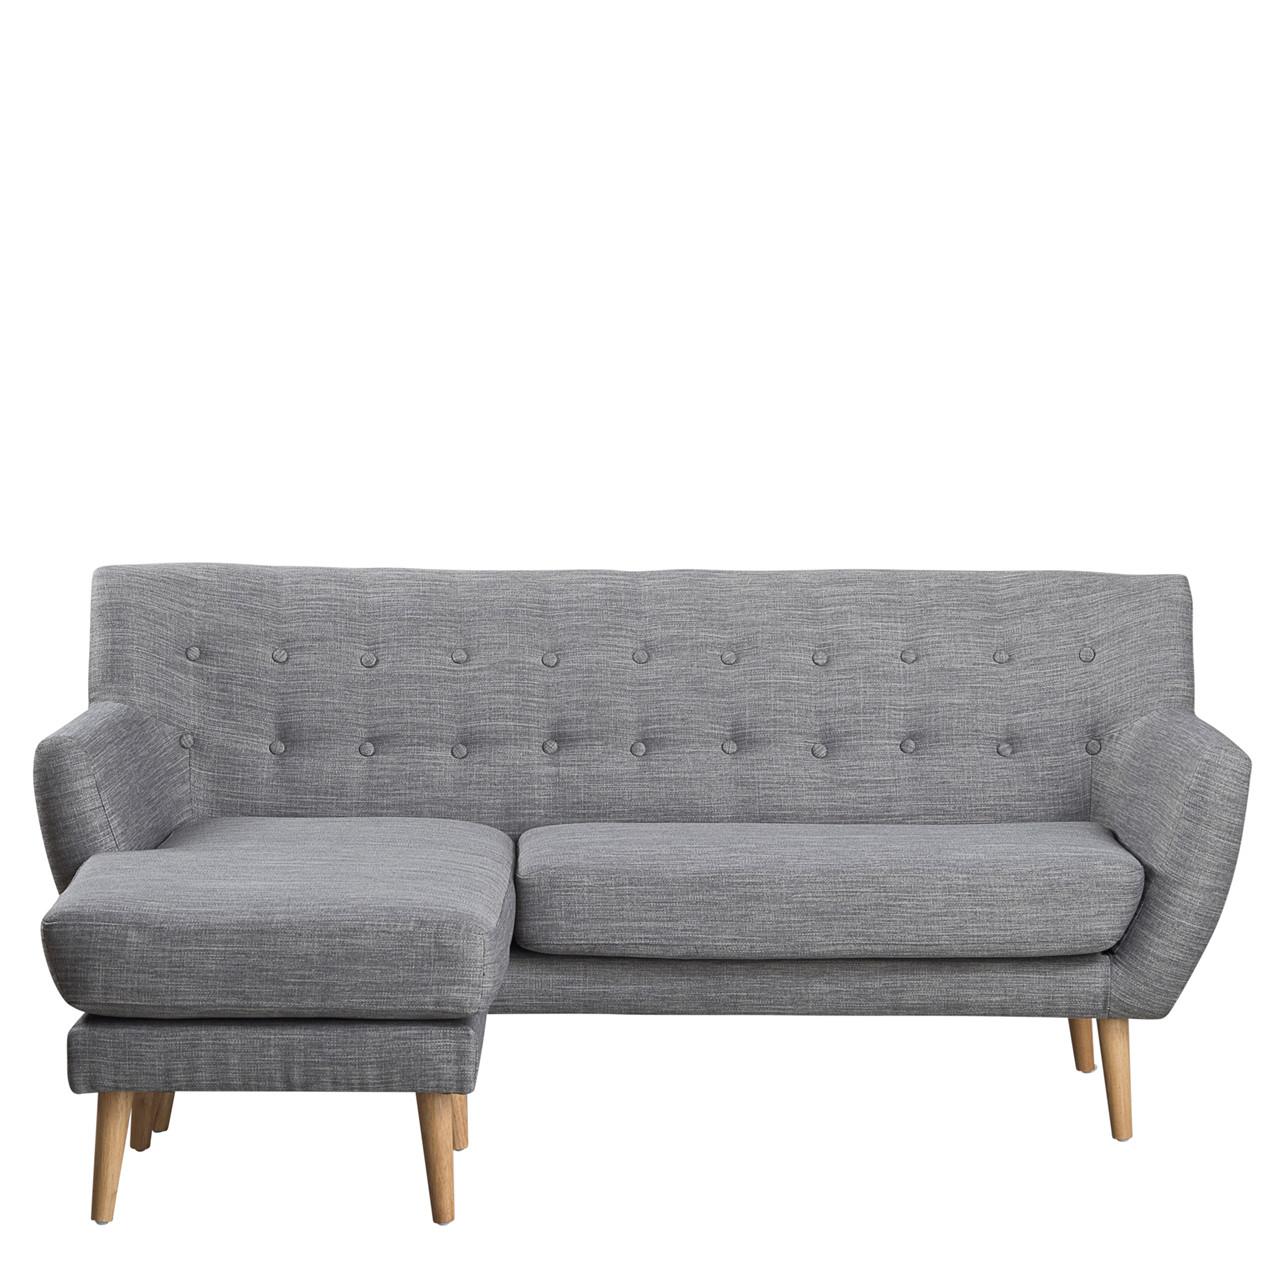 sofa chaiselong MIAMI chaiselong grå venstrevendt sofa chaiselong